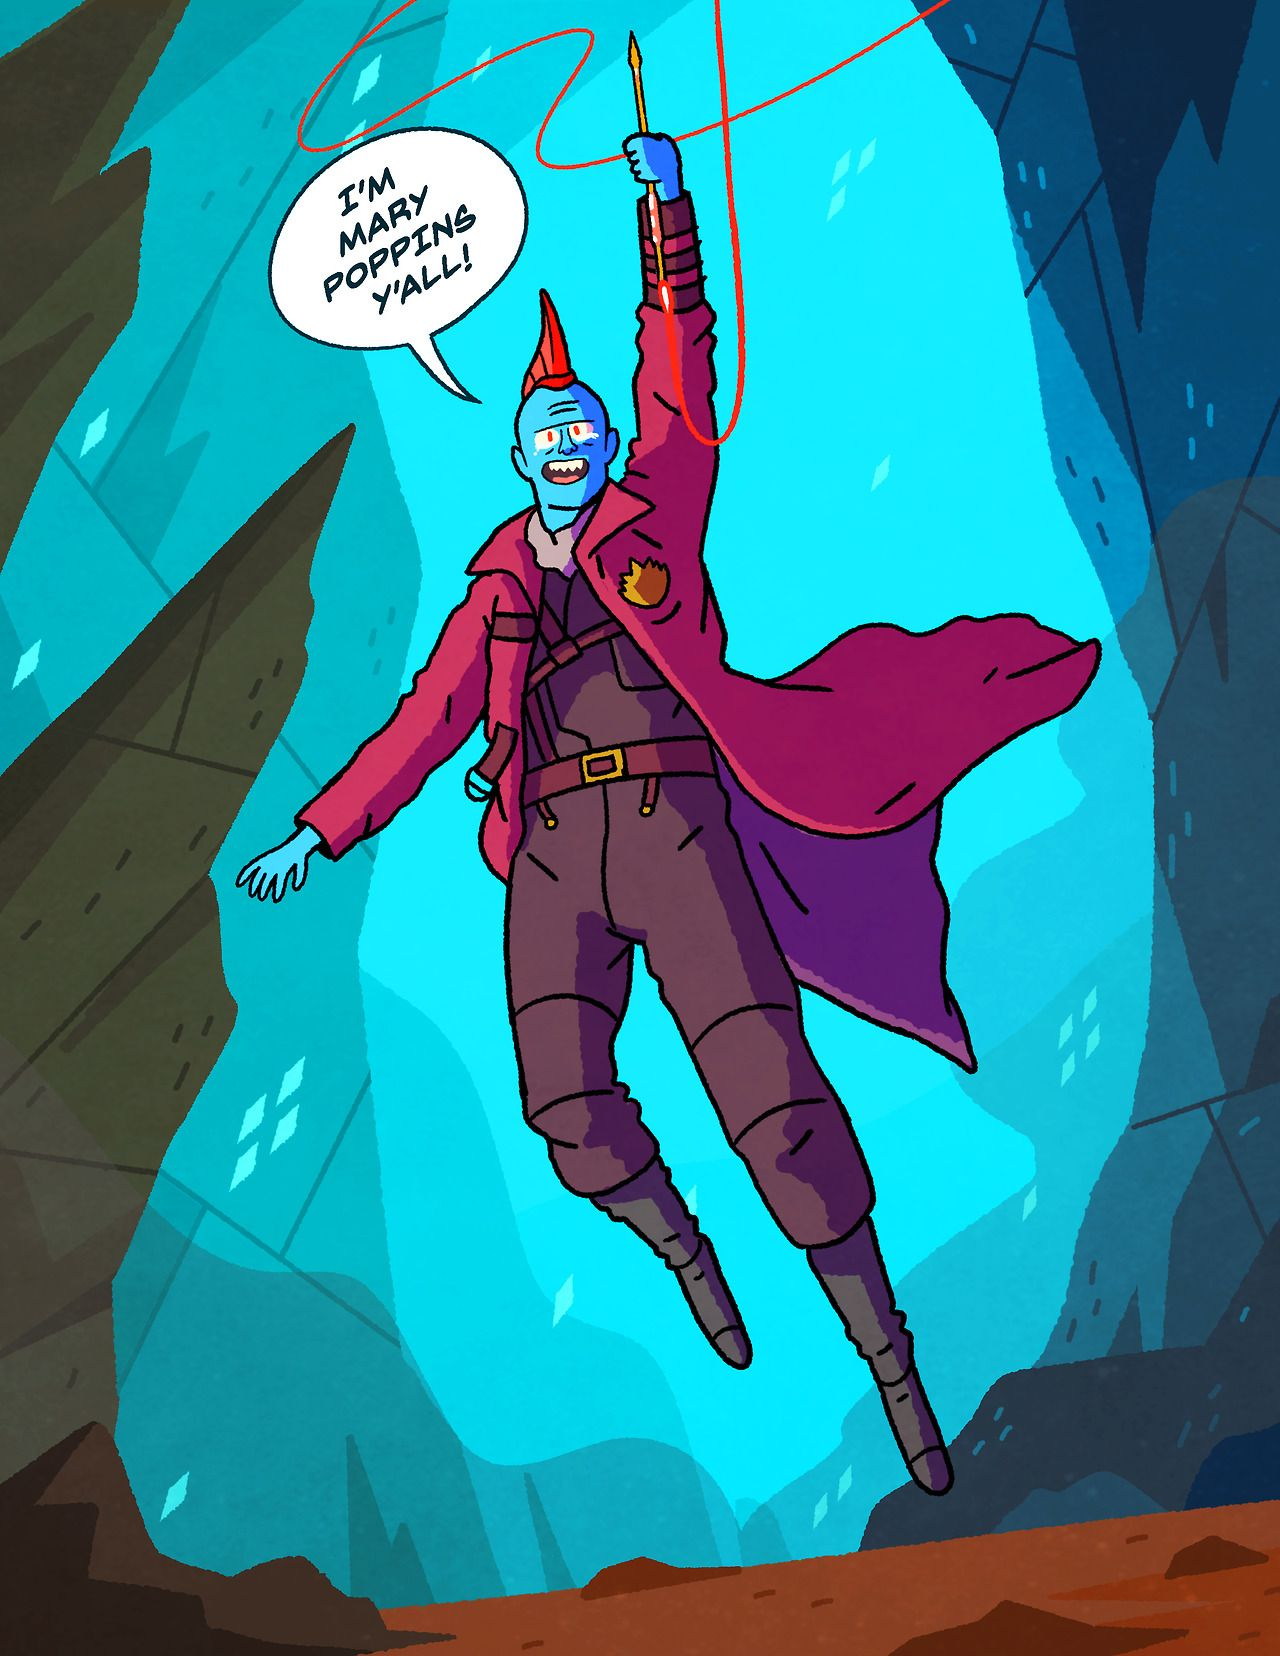 Pin On Superhero Inspiration